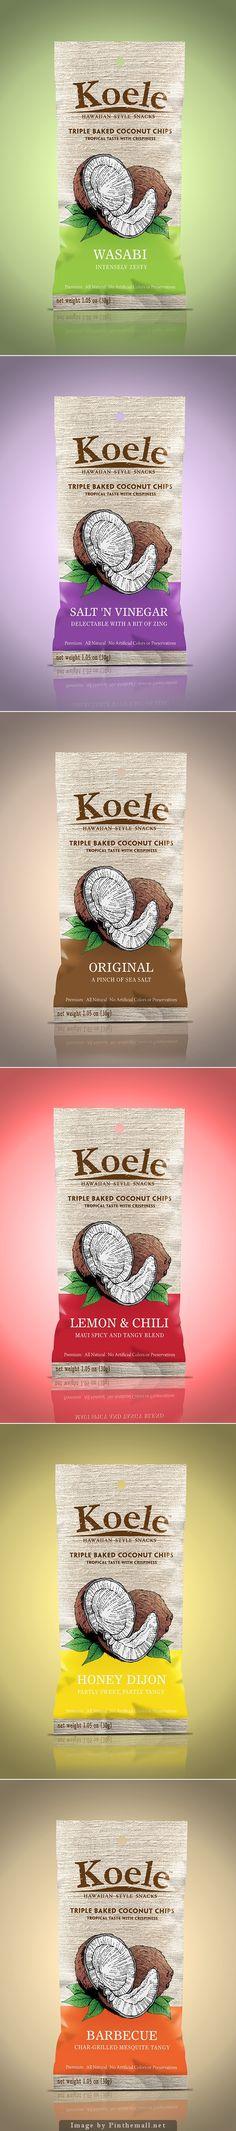 Koele Coconut Chips by Ujee Khan